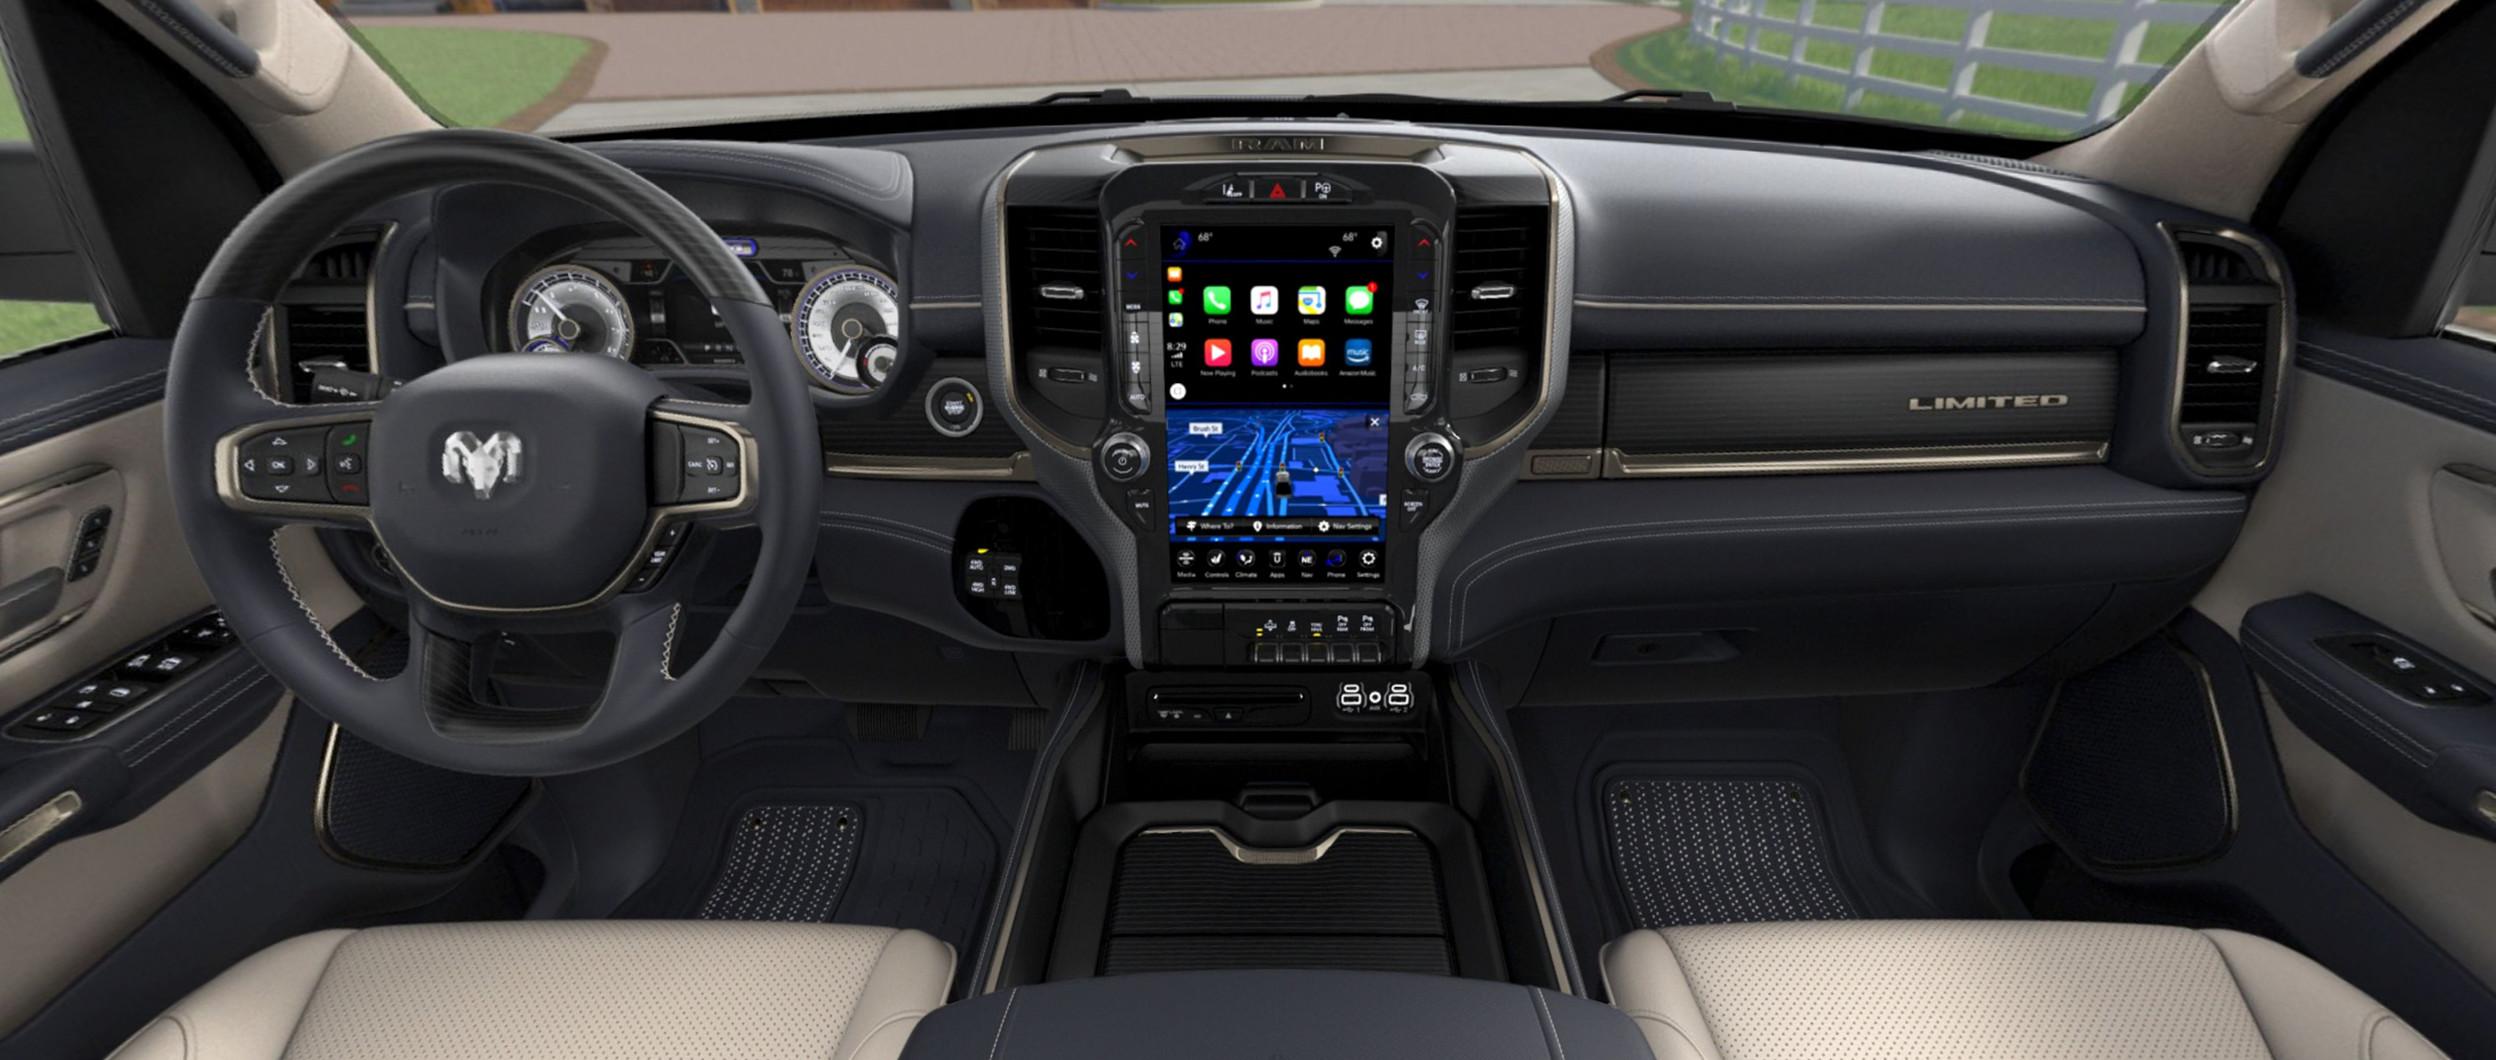 Dodge ram manual transmission review   Dodge 6 7L Cummins G56